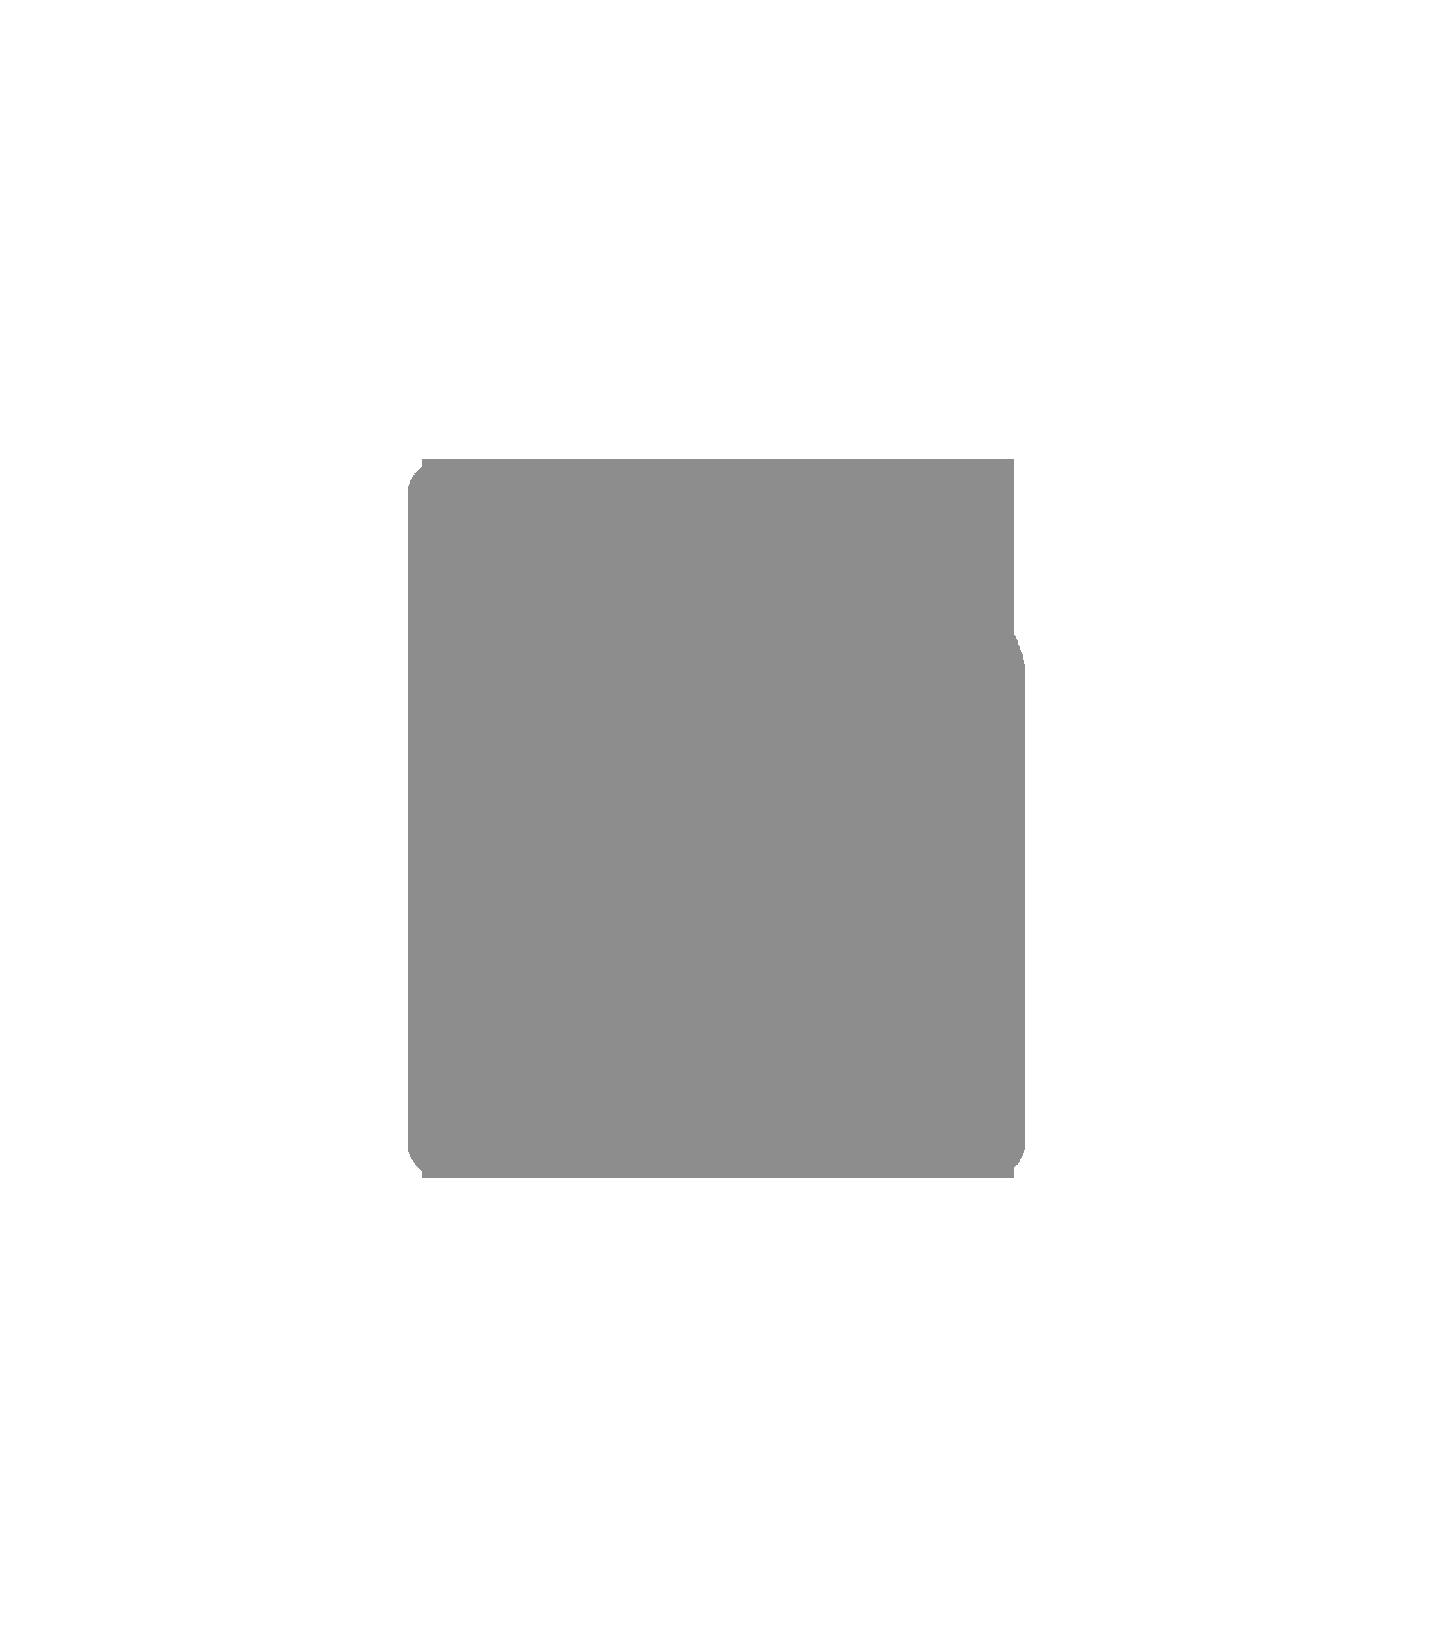 rez-de-chaussée Haus auf sechs Pfeilern de Bearth & Deplazes Architekten AG<br>Valentin Bearth – Andrea Deplazes – Daniel Ladner